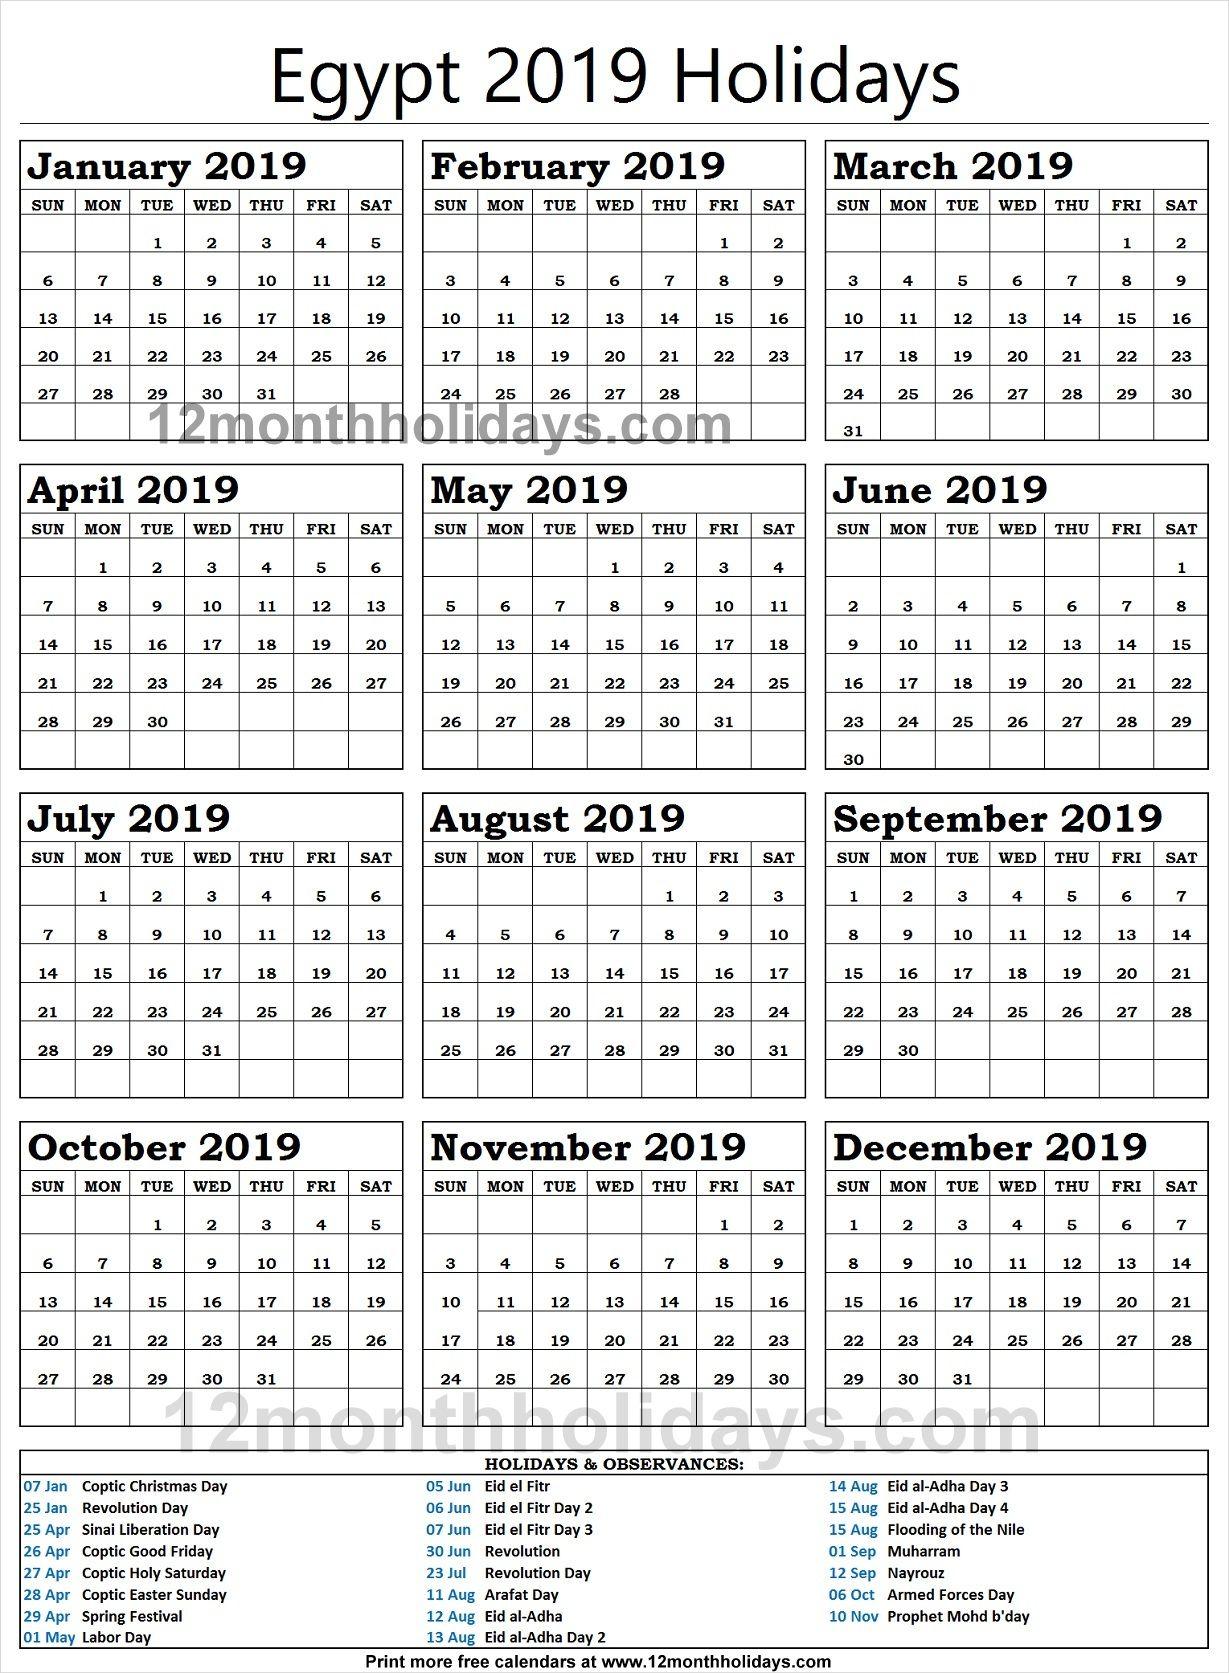 Egypt School Holidays 2019 National Holiday Calendar School Holidays Holiday Calendar